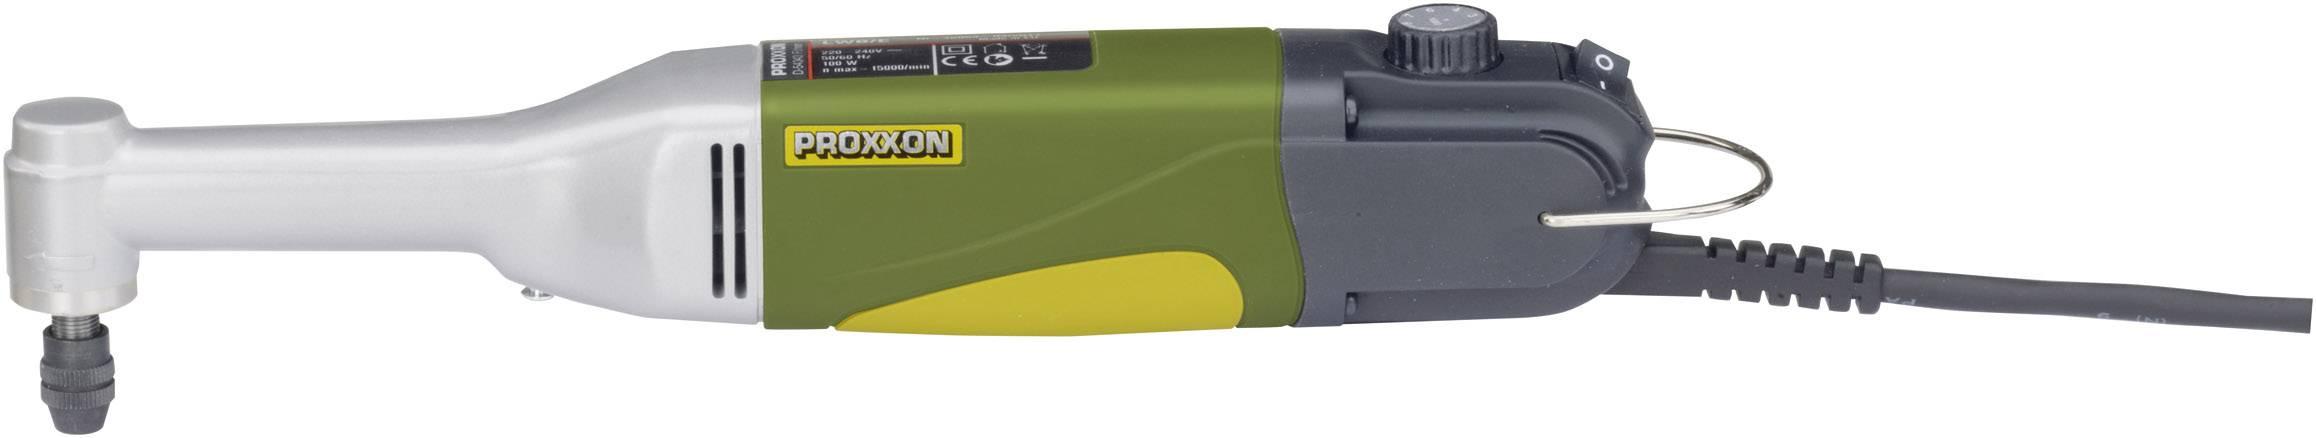 Úhlová vrtačka s dlouhým krkemProxxon Micromot LWB/E, 100 W